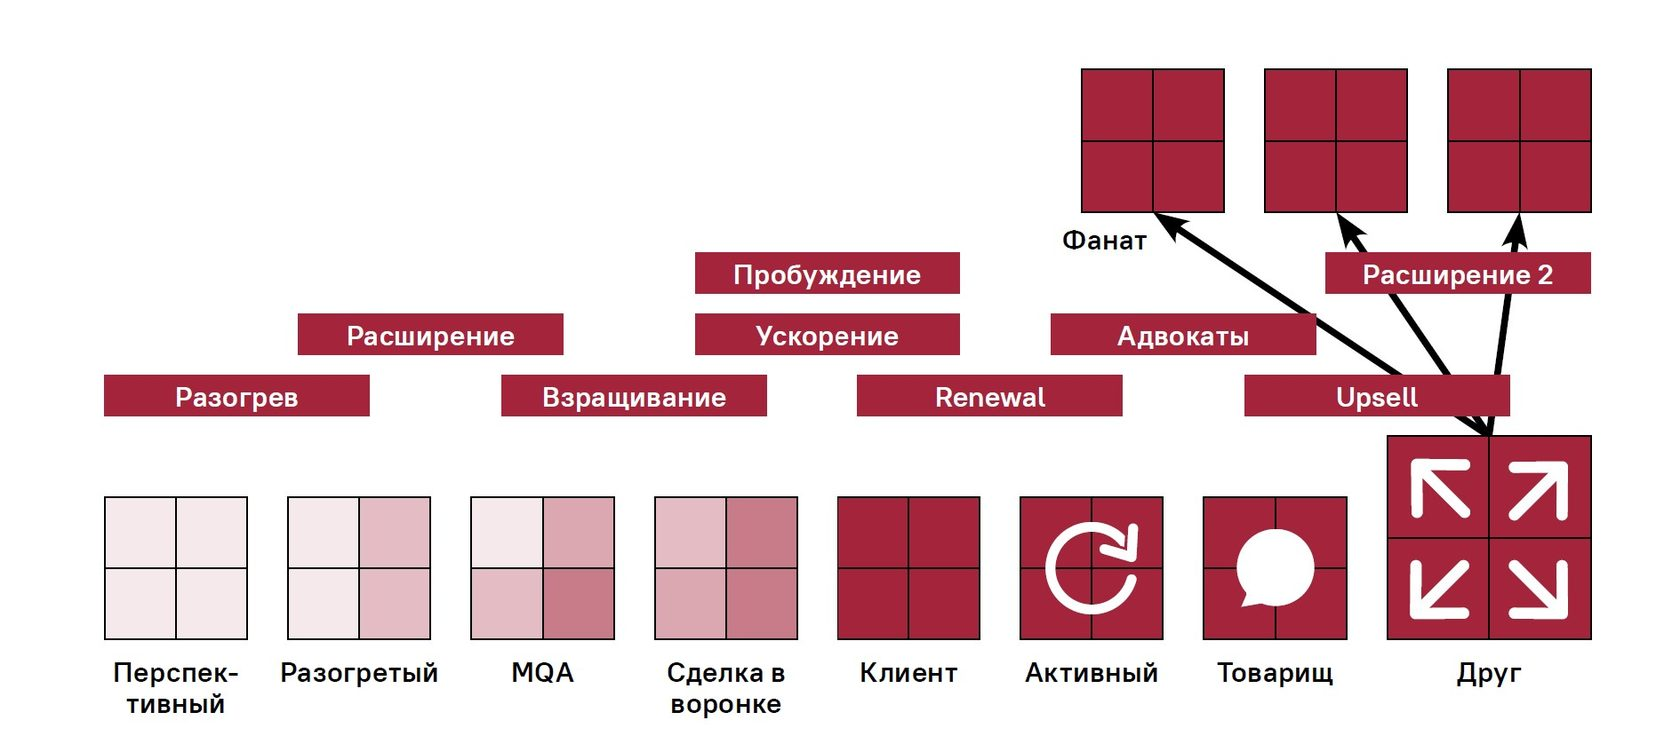 Основные ABM-программы на этапах пути клиента